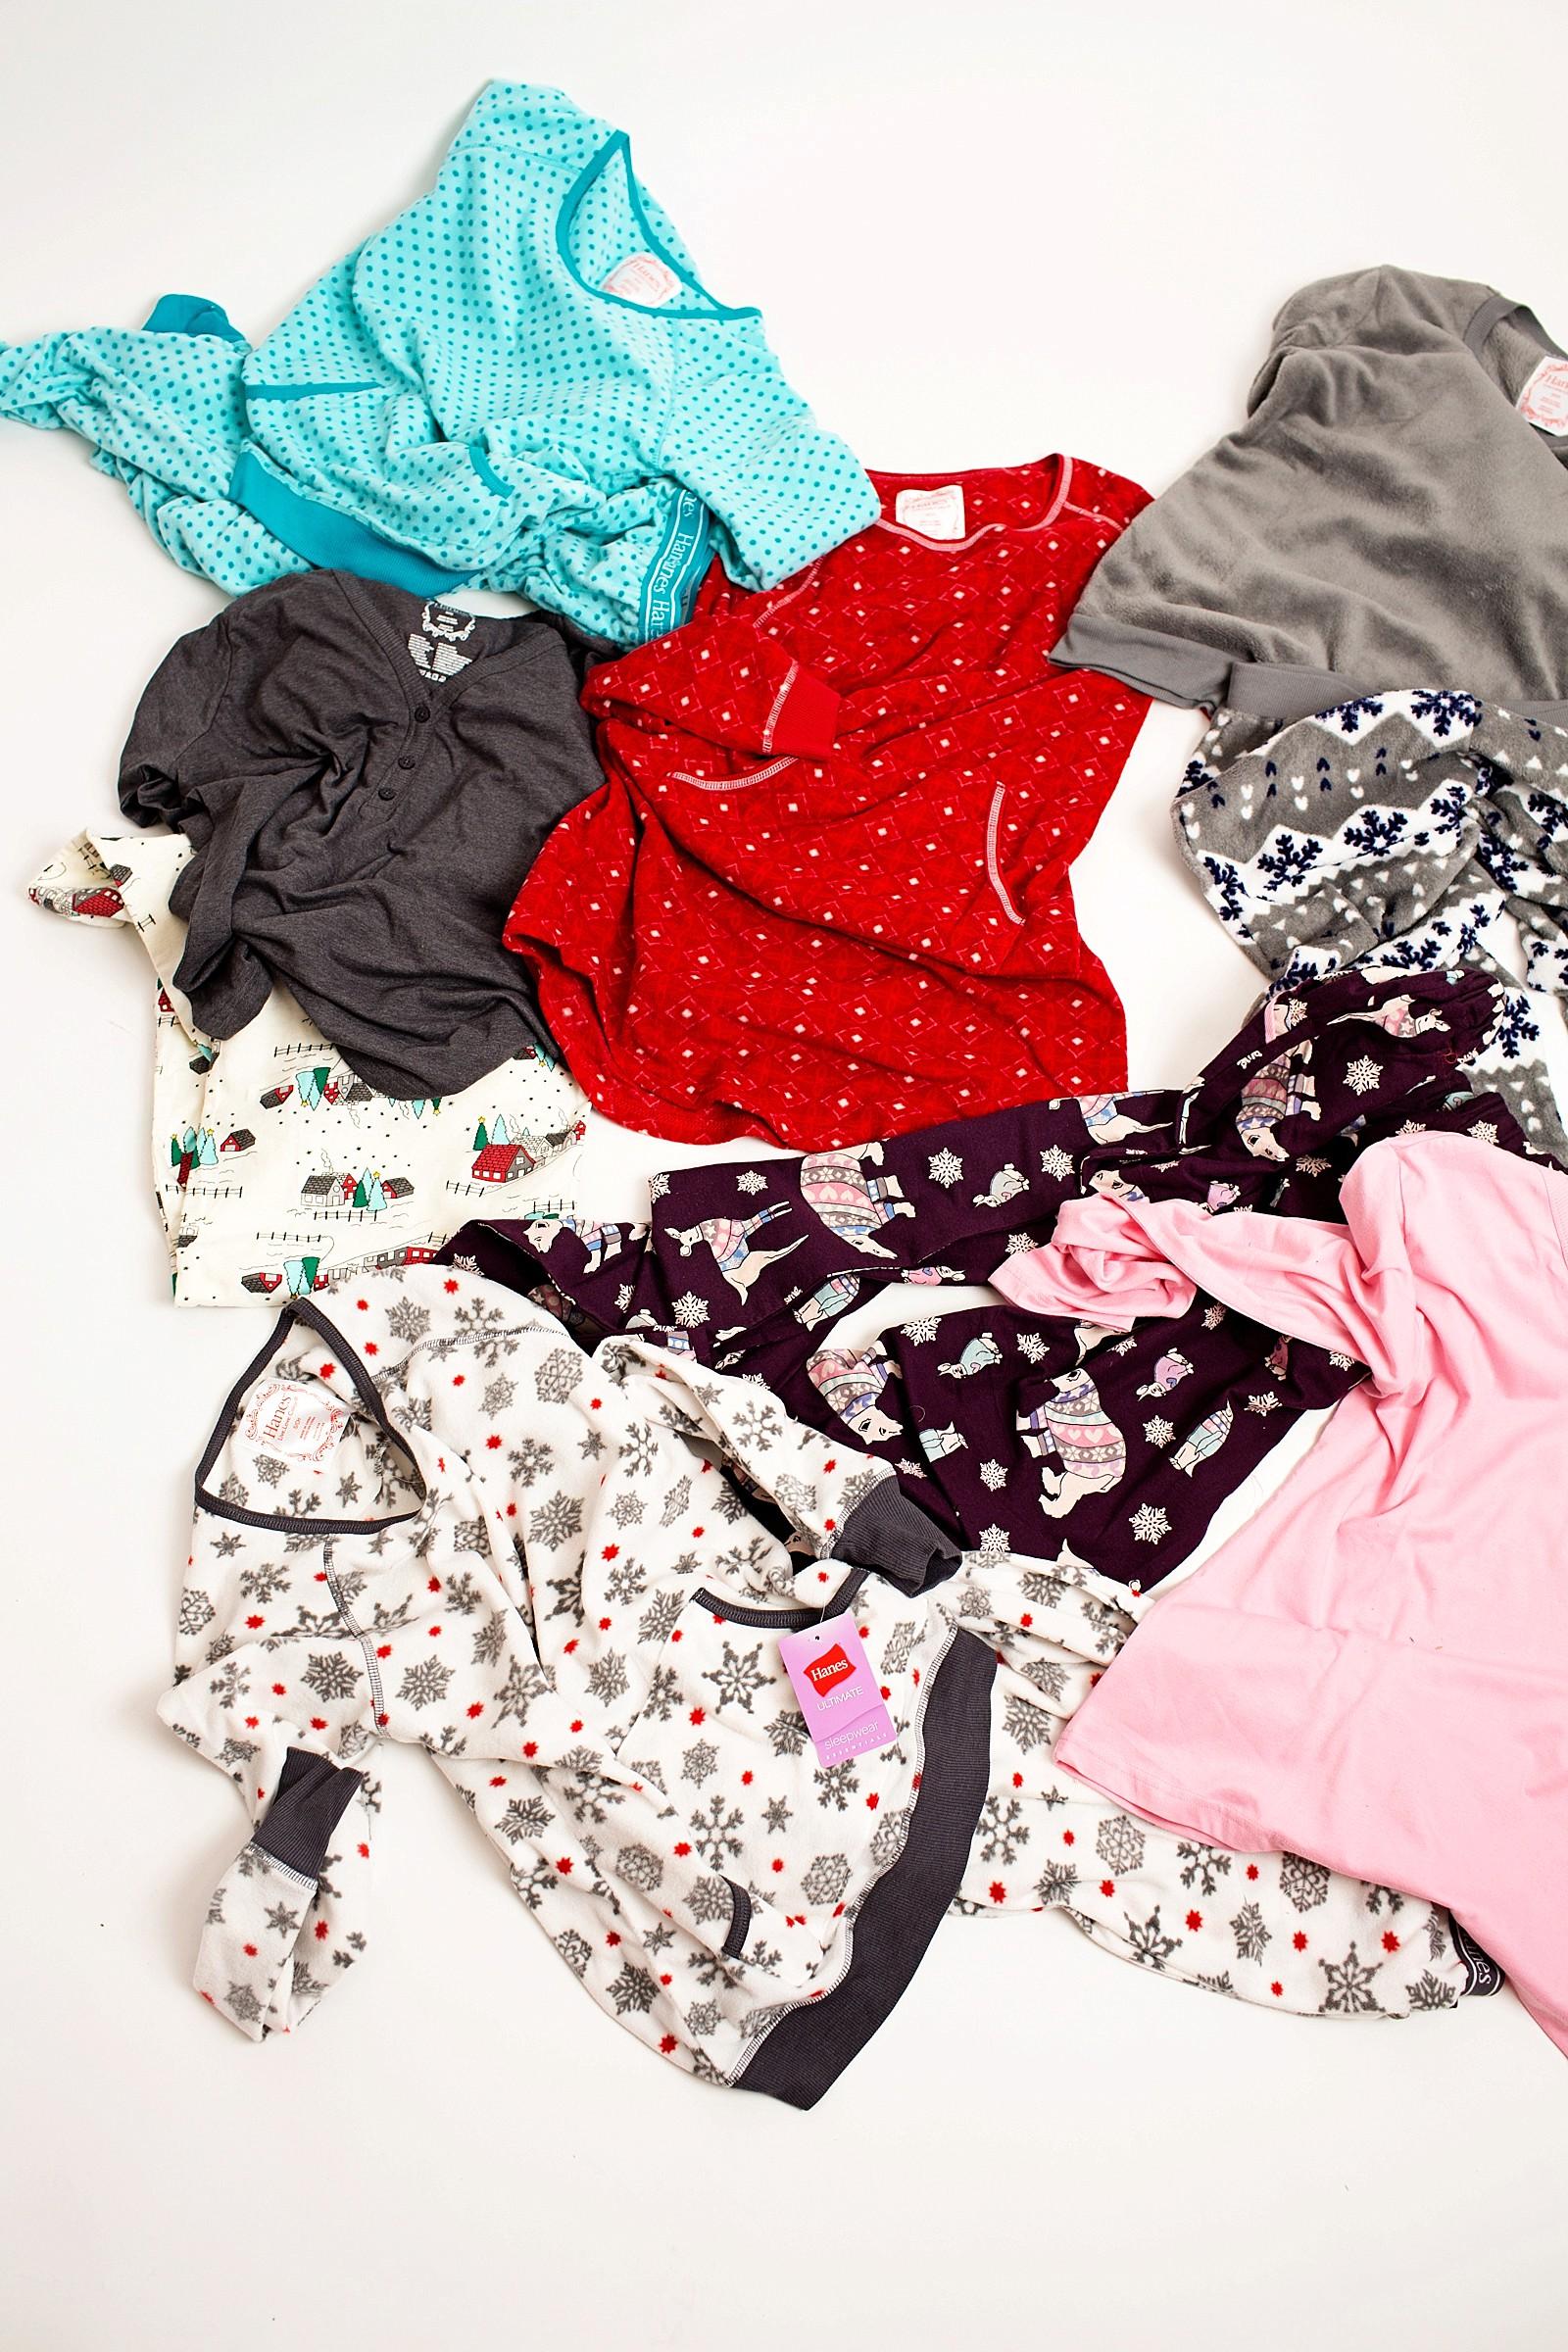 hanes-christmas-pajamas-girls-pajama-party-ideas-cute-jammies-diana-elizabeth-lifestyle-fashion-blogger-phoenix-arizona-1808